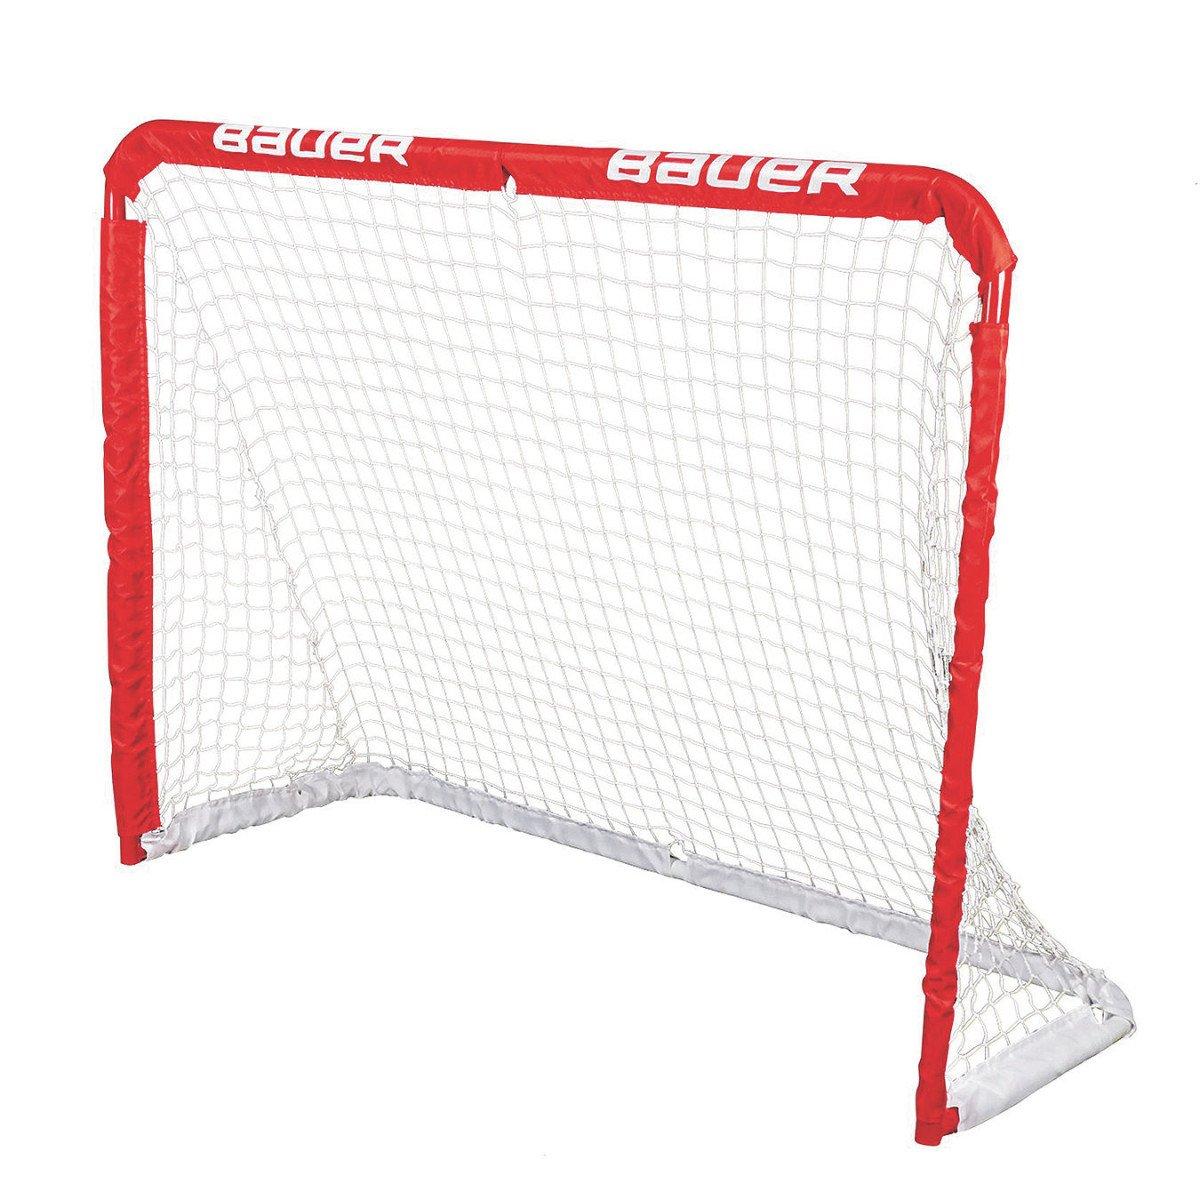 Bauer Street Hockey Junior Recreational Steel Goal, 48 x 37-Inch Bauer Junior REC Steel Goal Red Bauer Performance Sports 1046694